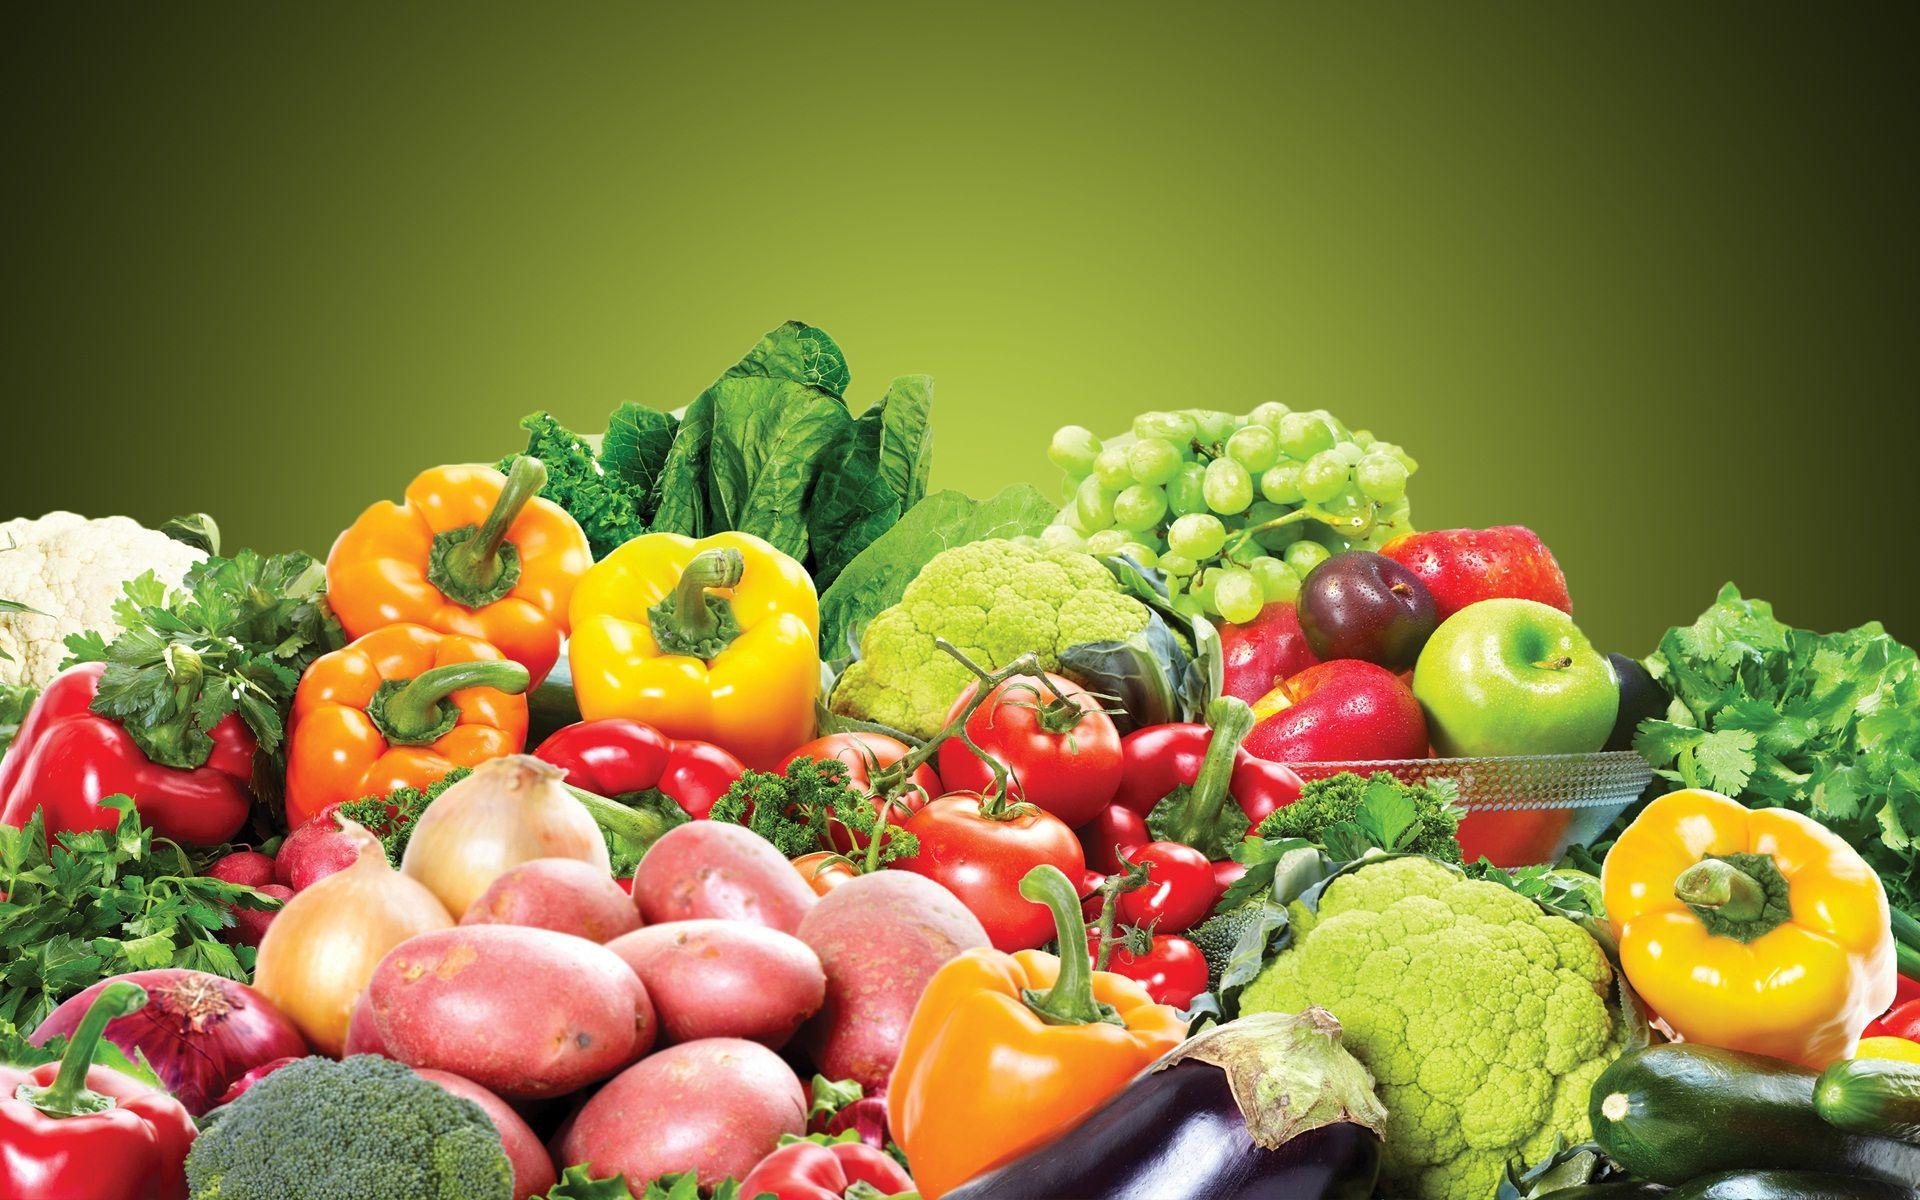 Fresh fruits and vegetable HD wallpaper Beautiful hd wallpaper 1920x1200